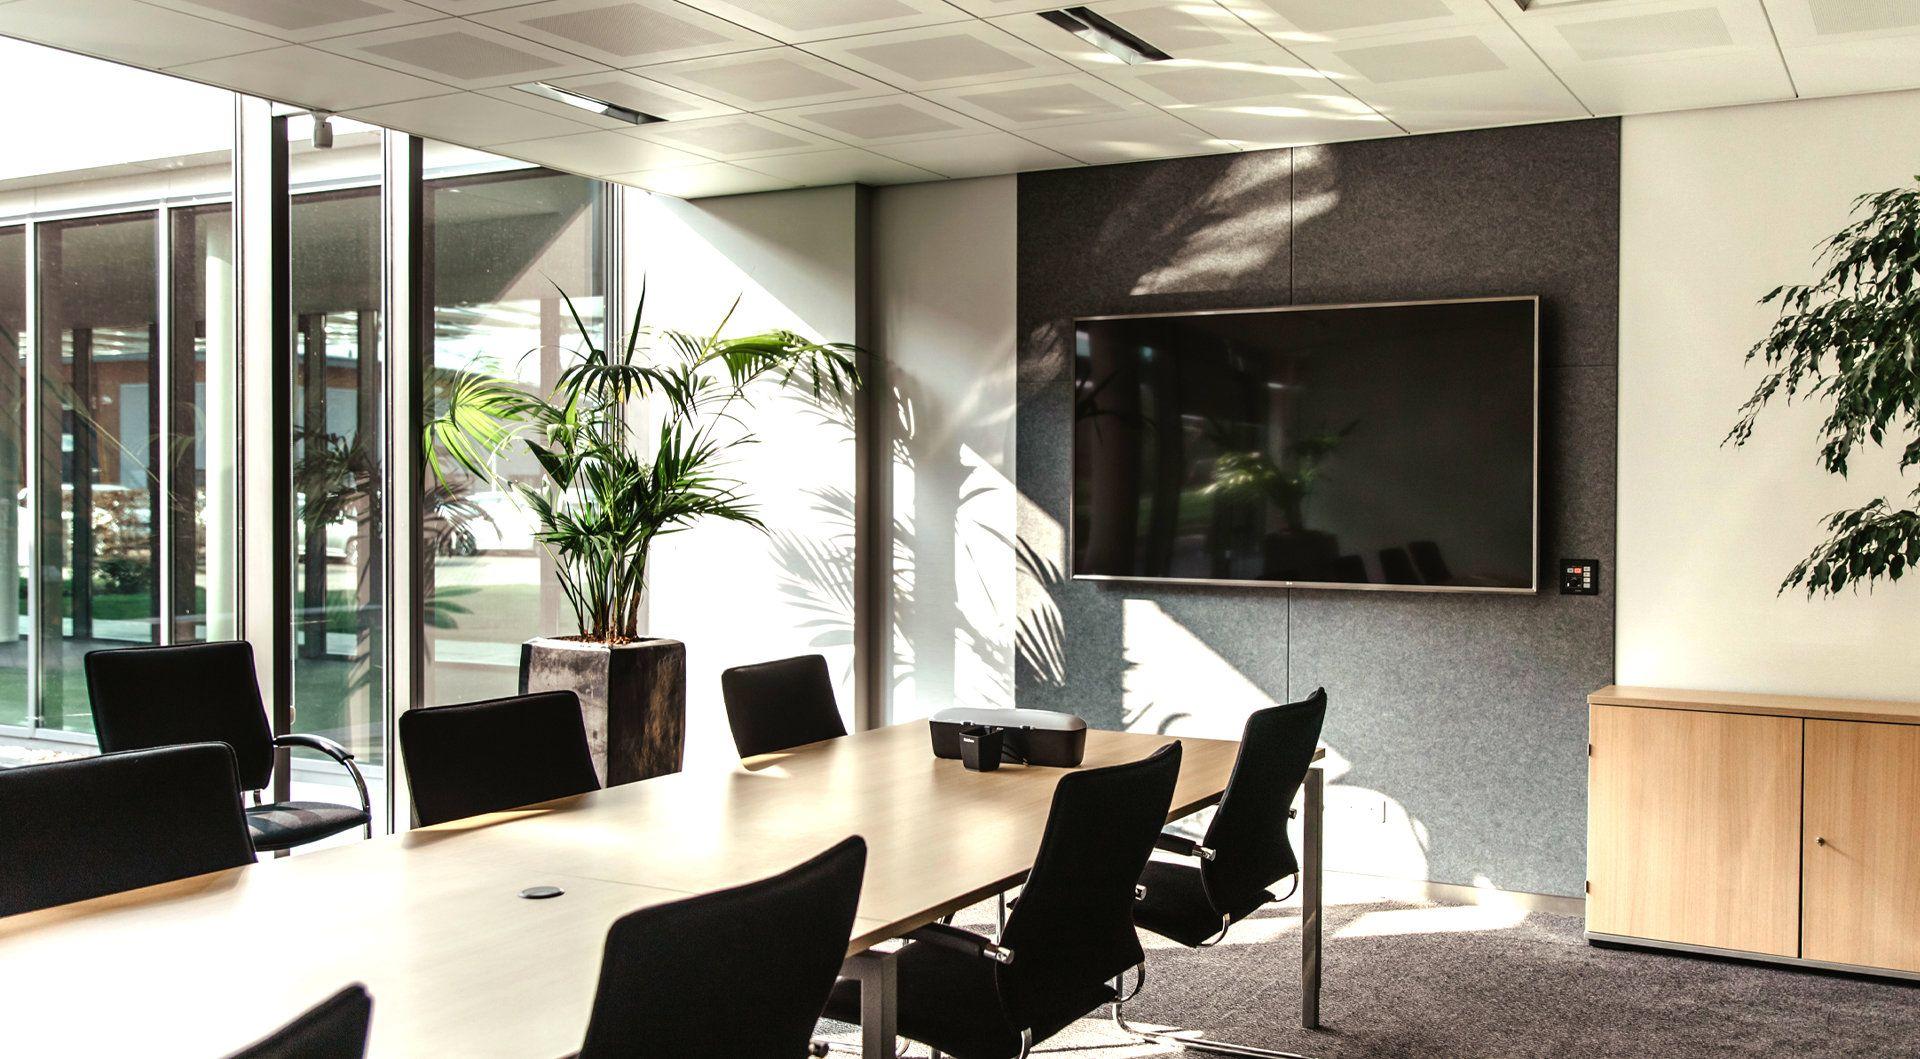 "Benq IL490 124,5 cm (49"") LED Full HD Touchscreen Digitale signage flatscreen Zwart - Case studie de vries"